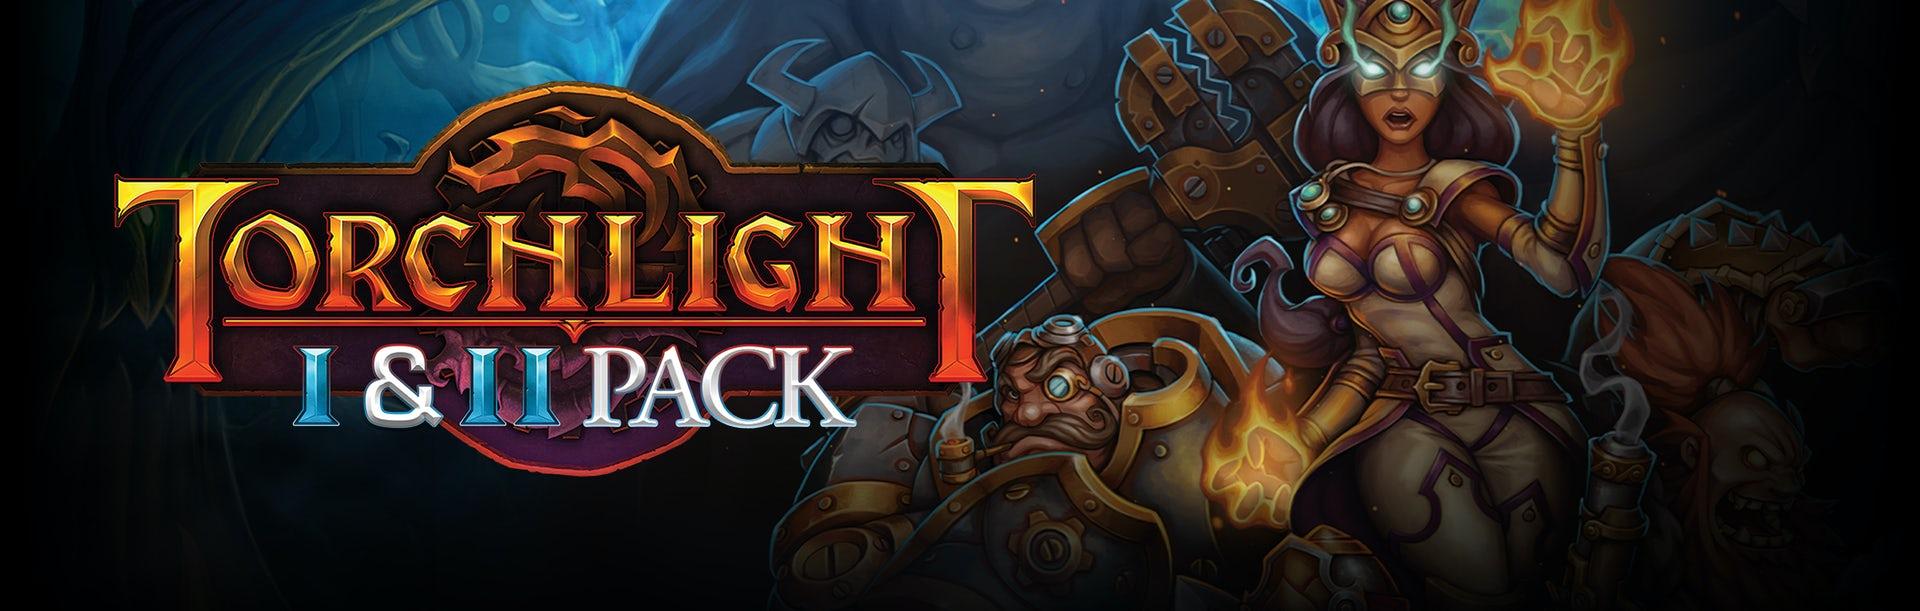 Star Deal - Torchlight I & II Pack @Fanatical